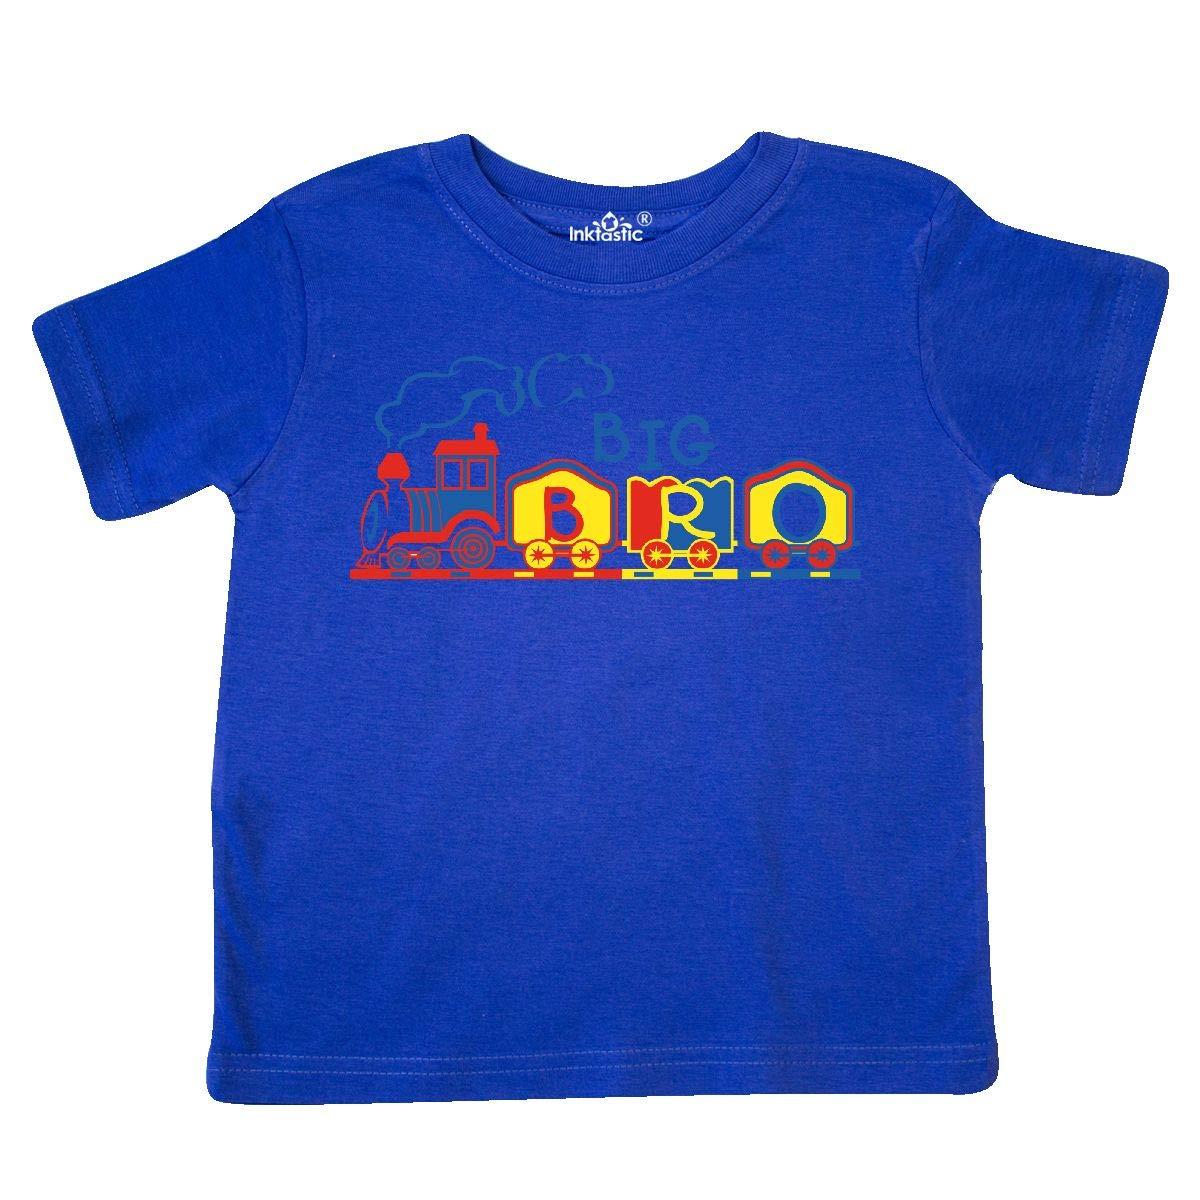 inktastic Train Big Bro Toddler T-Shirt